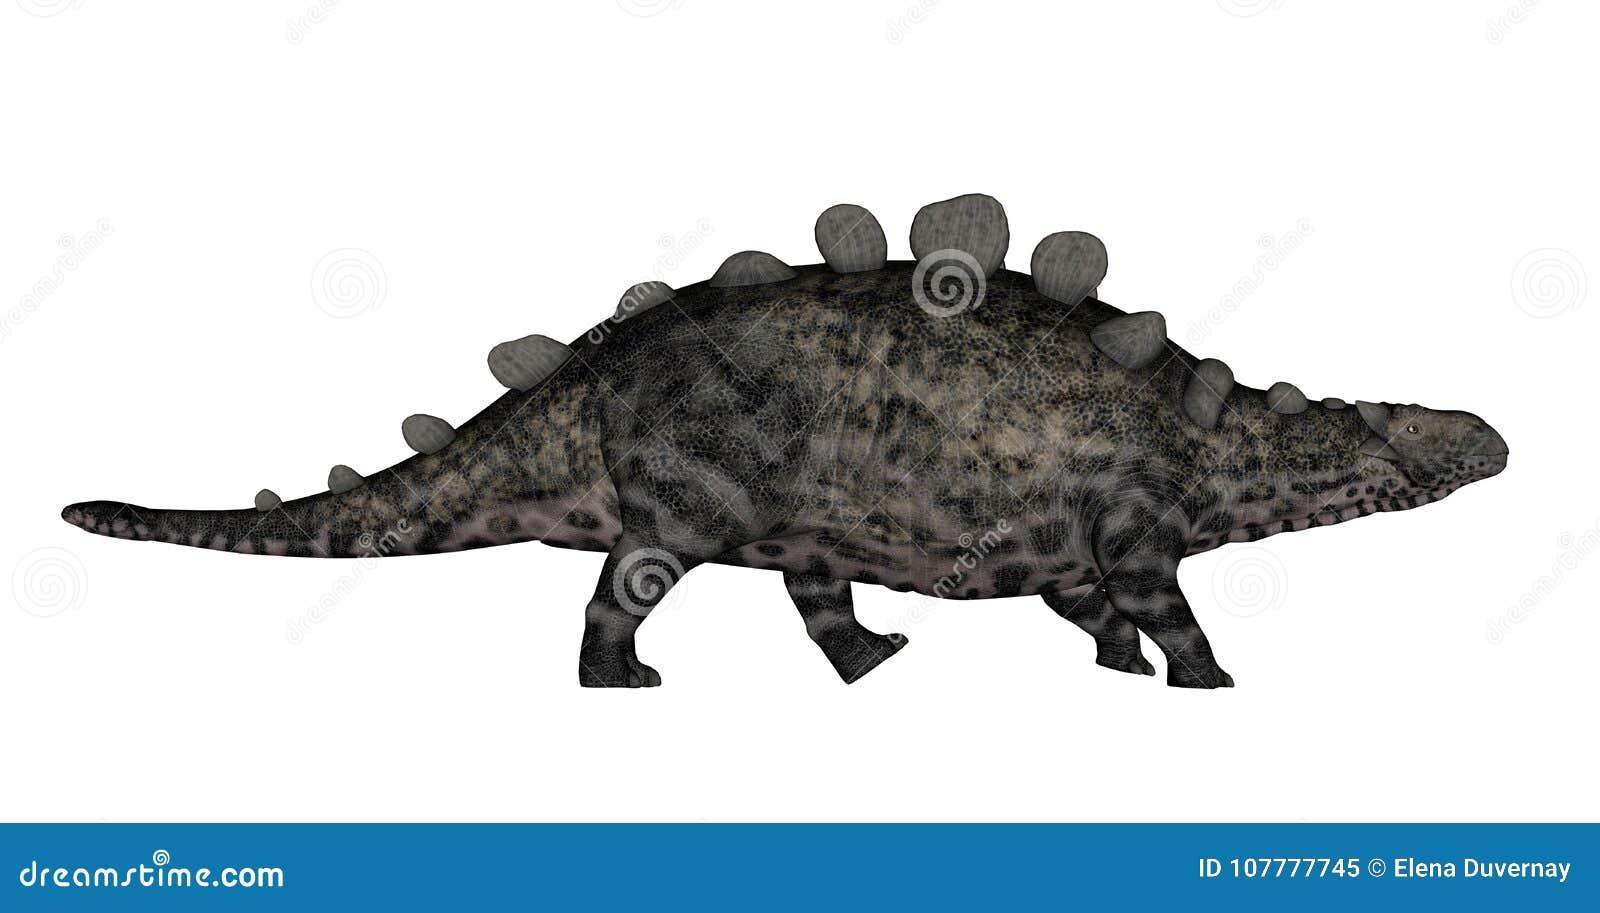 Chrichtonsaurus dinosaur walking - 3D render